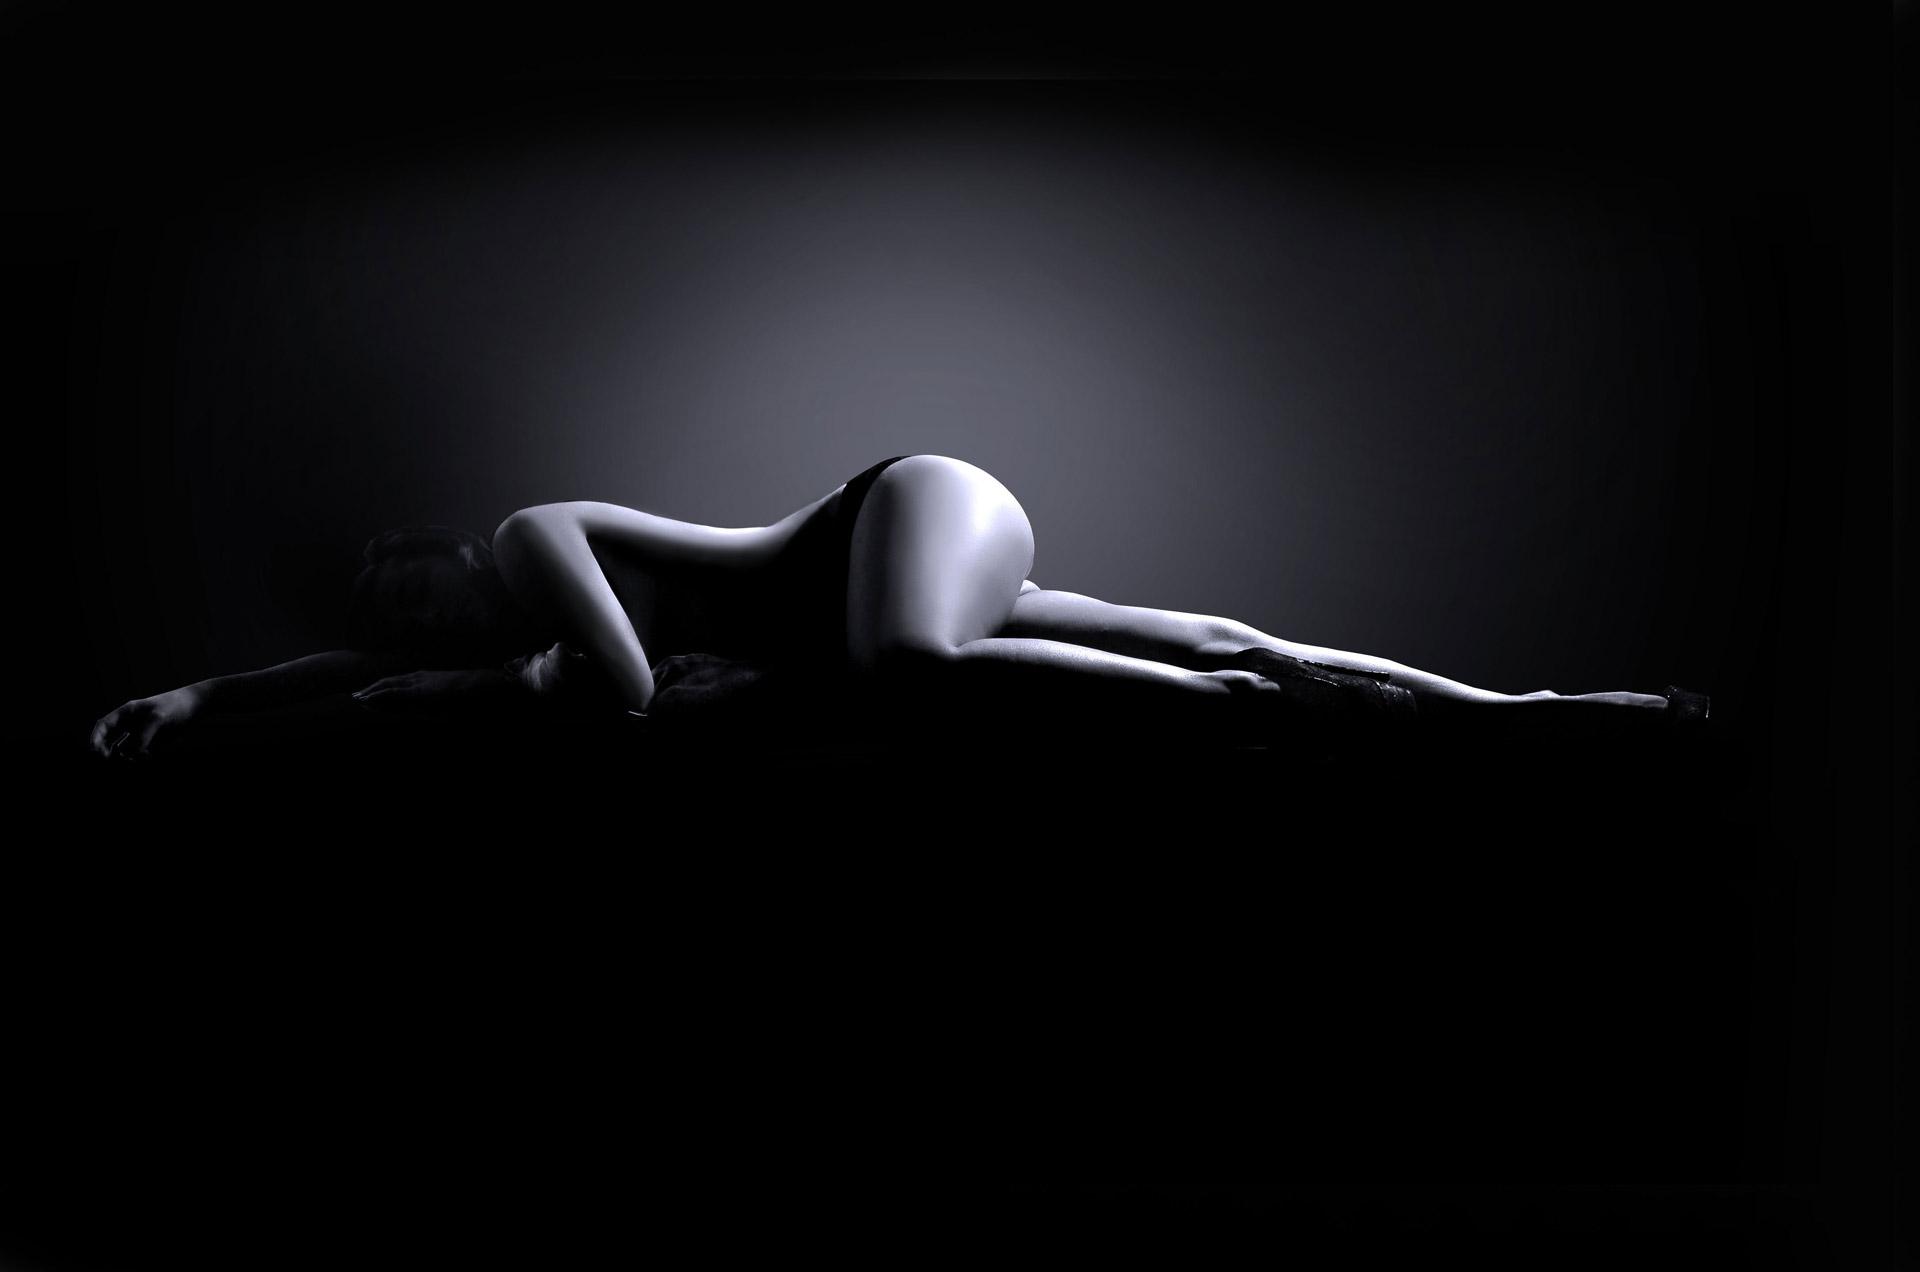 boudoir photography studio leicester